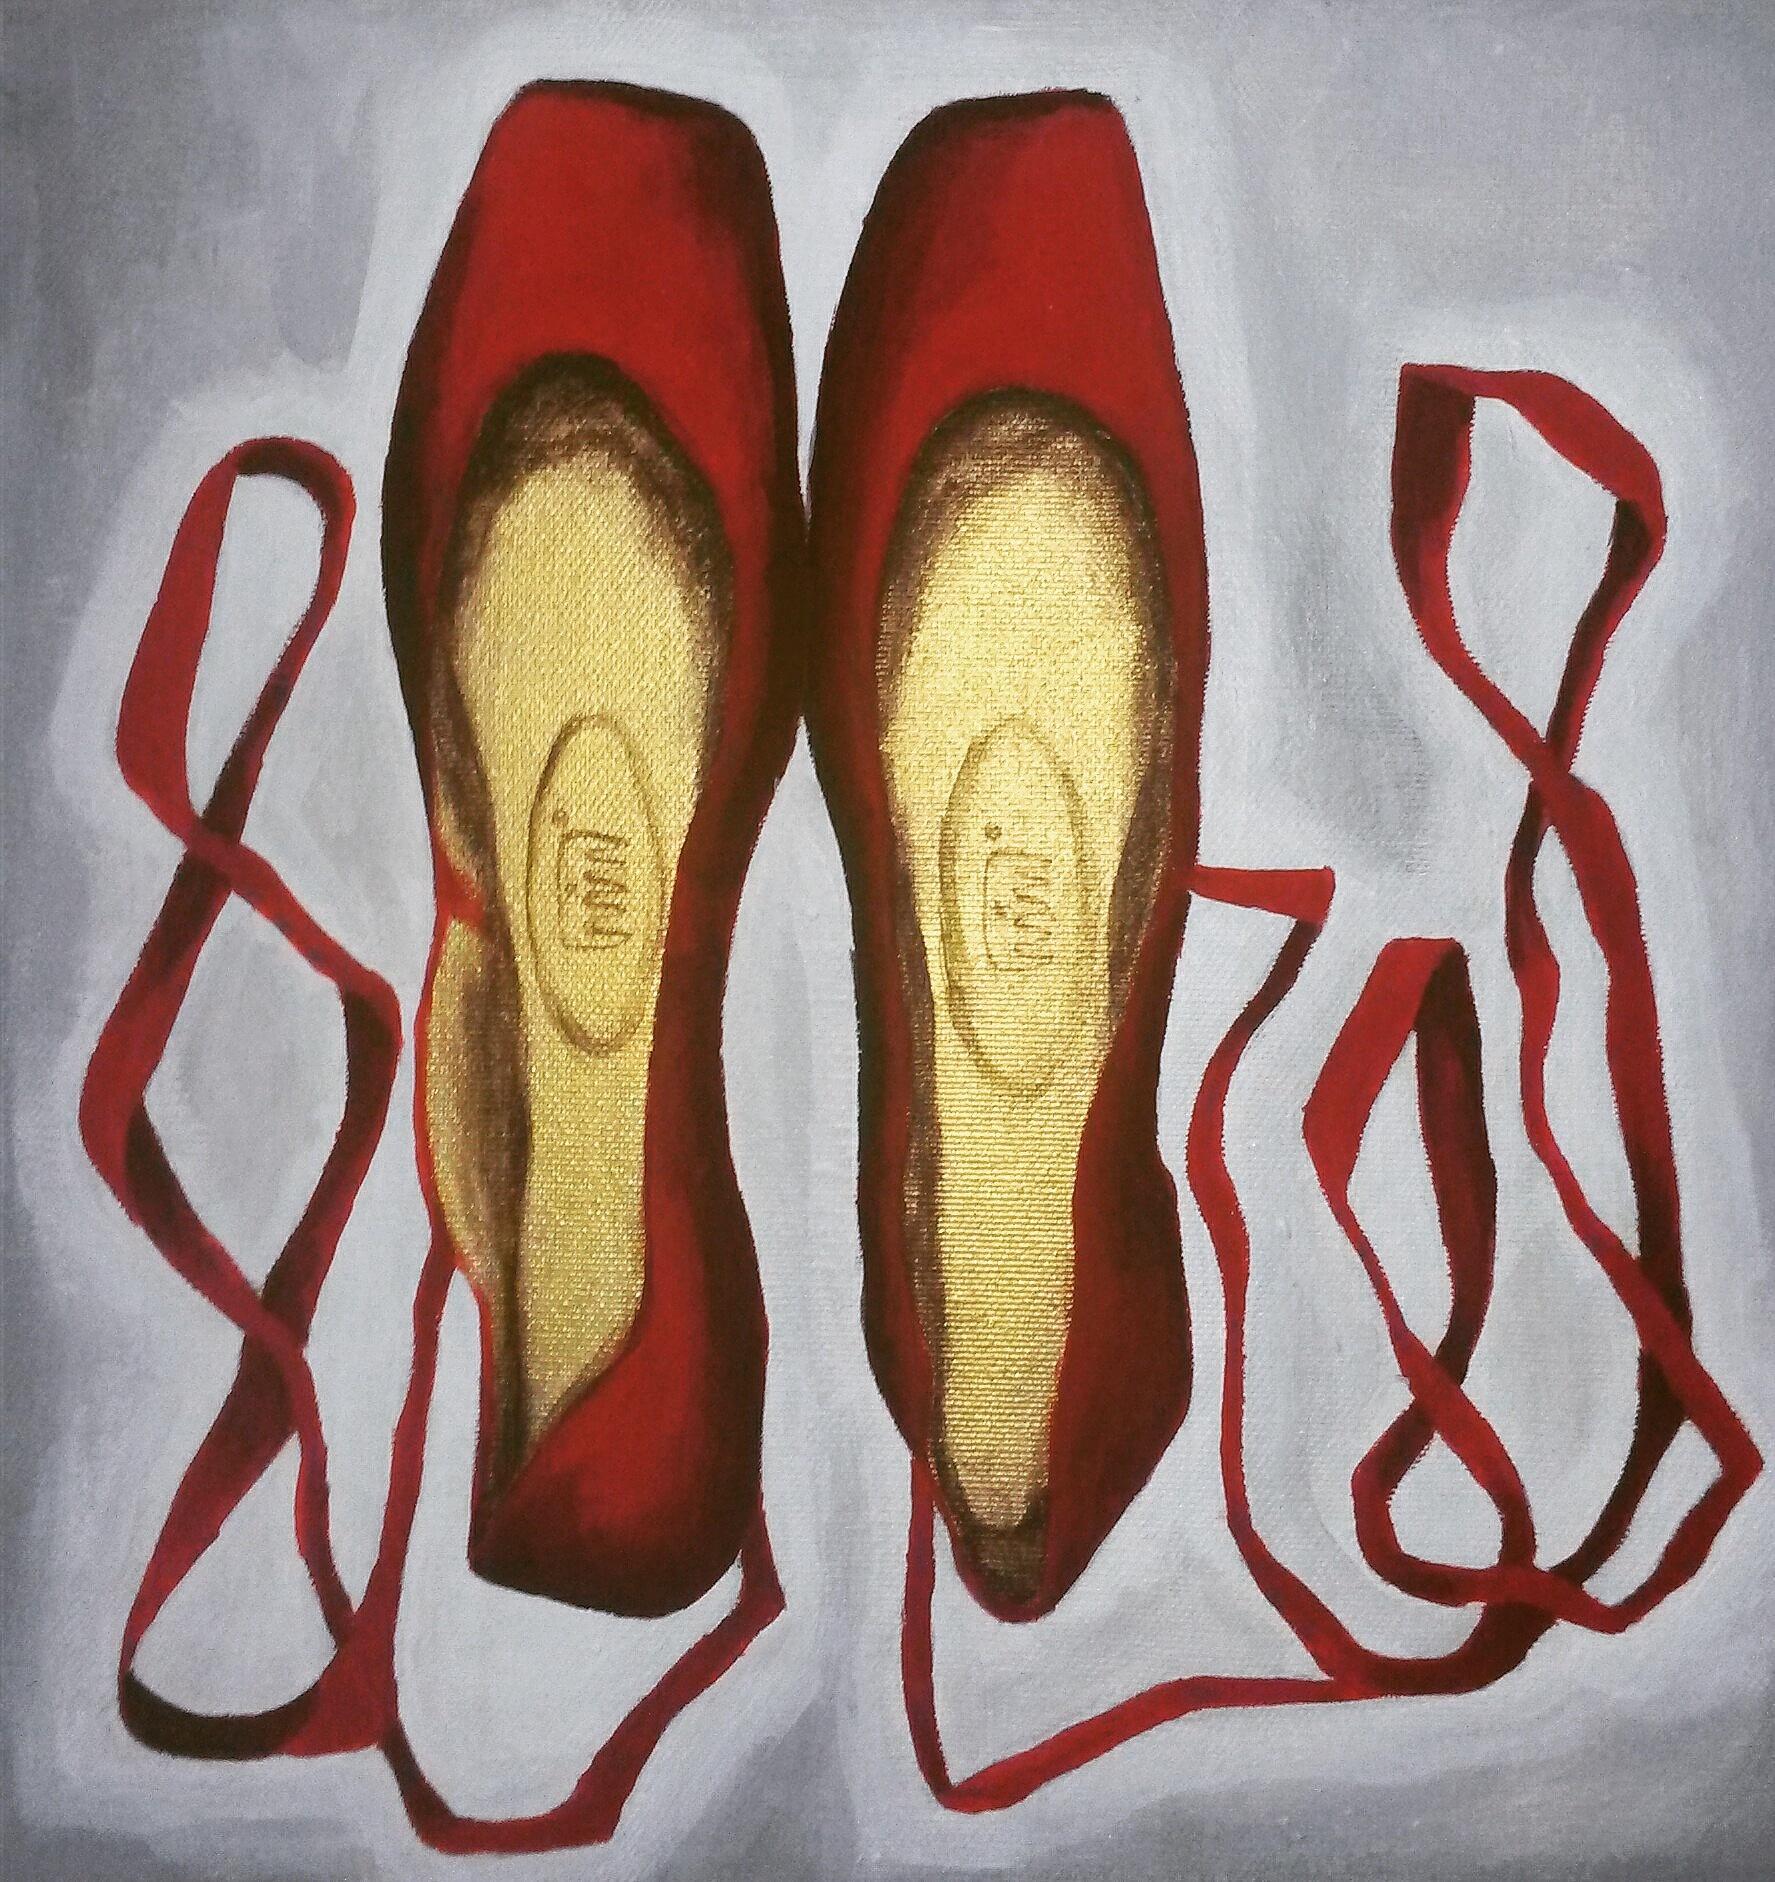 scarpette rosse ines merola opera celeste network scarpette rosse ines merola opera